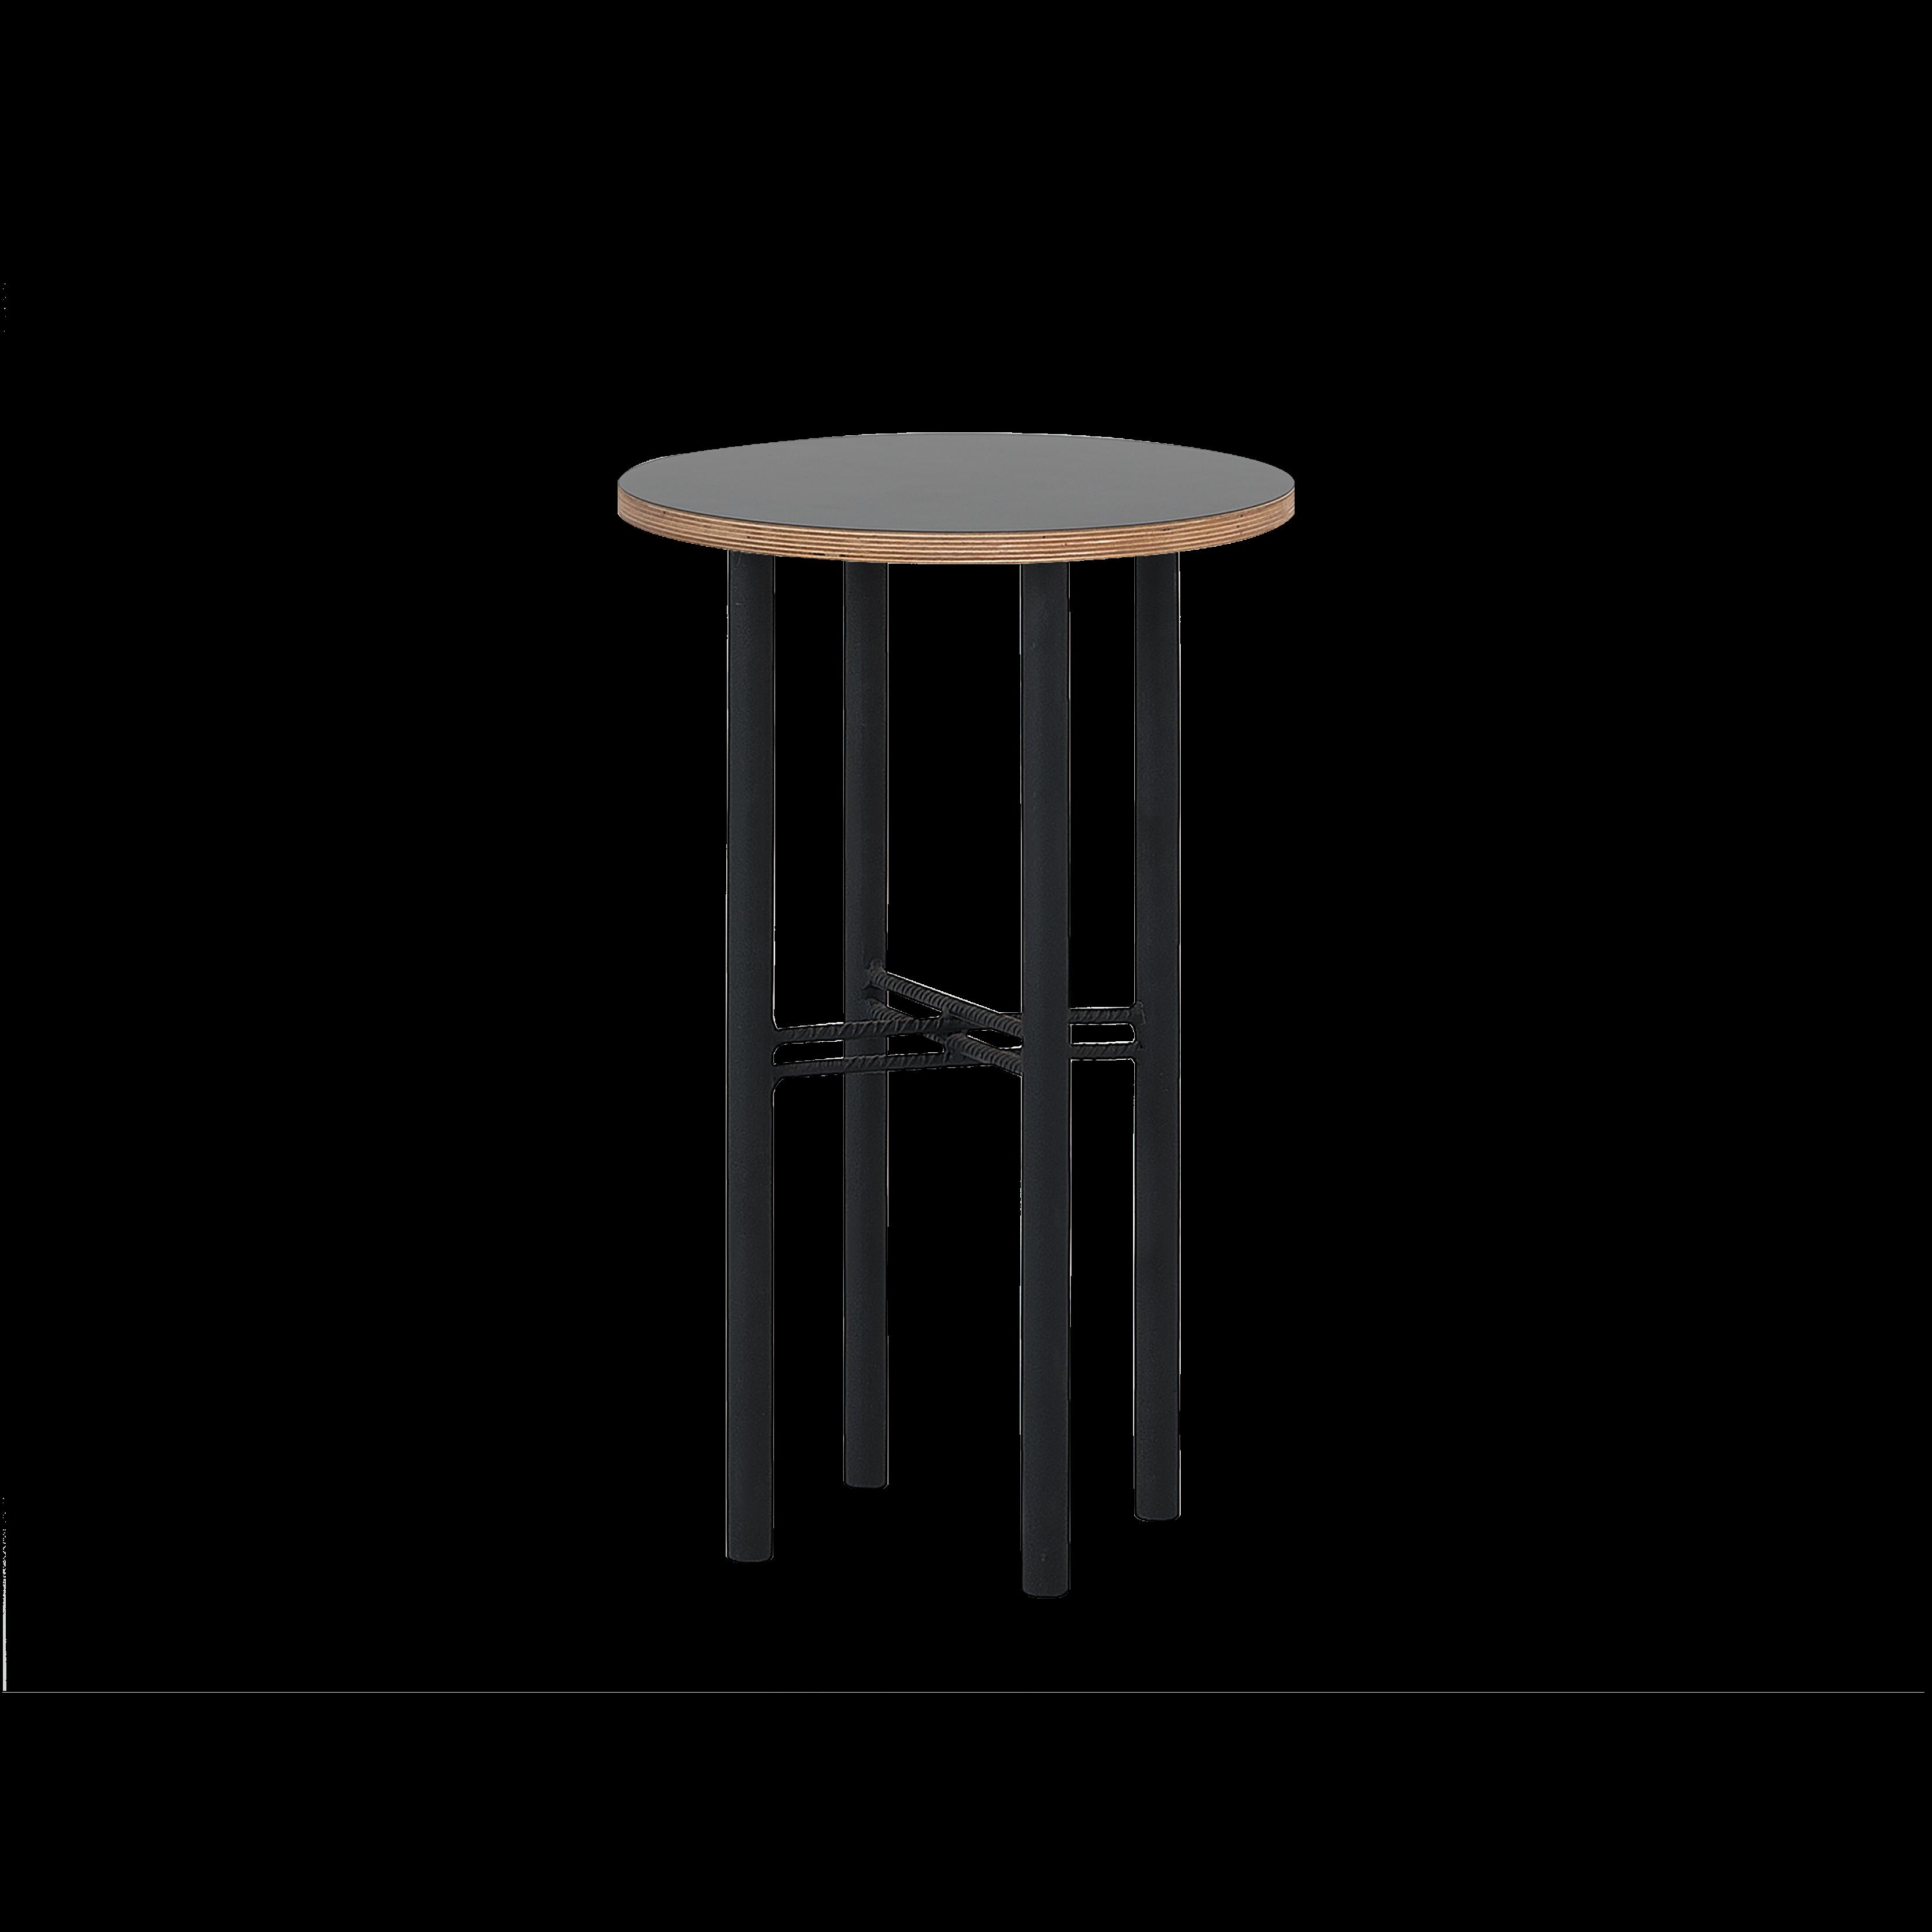 Coffee Table Pento 40 x 40 x H 60 cm | Black